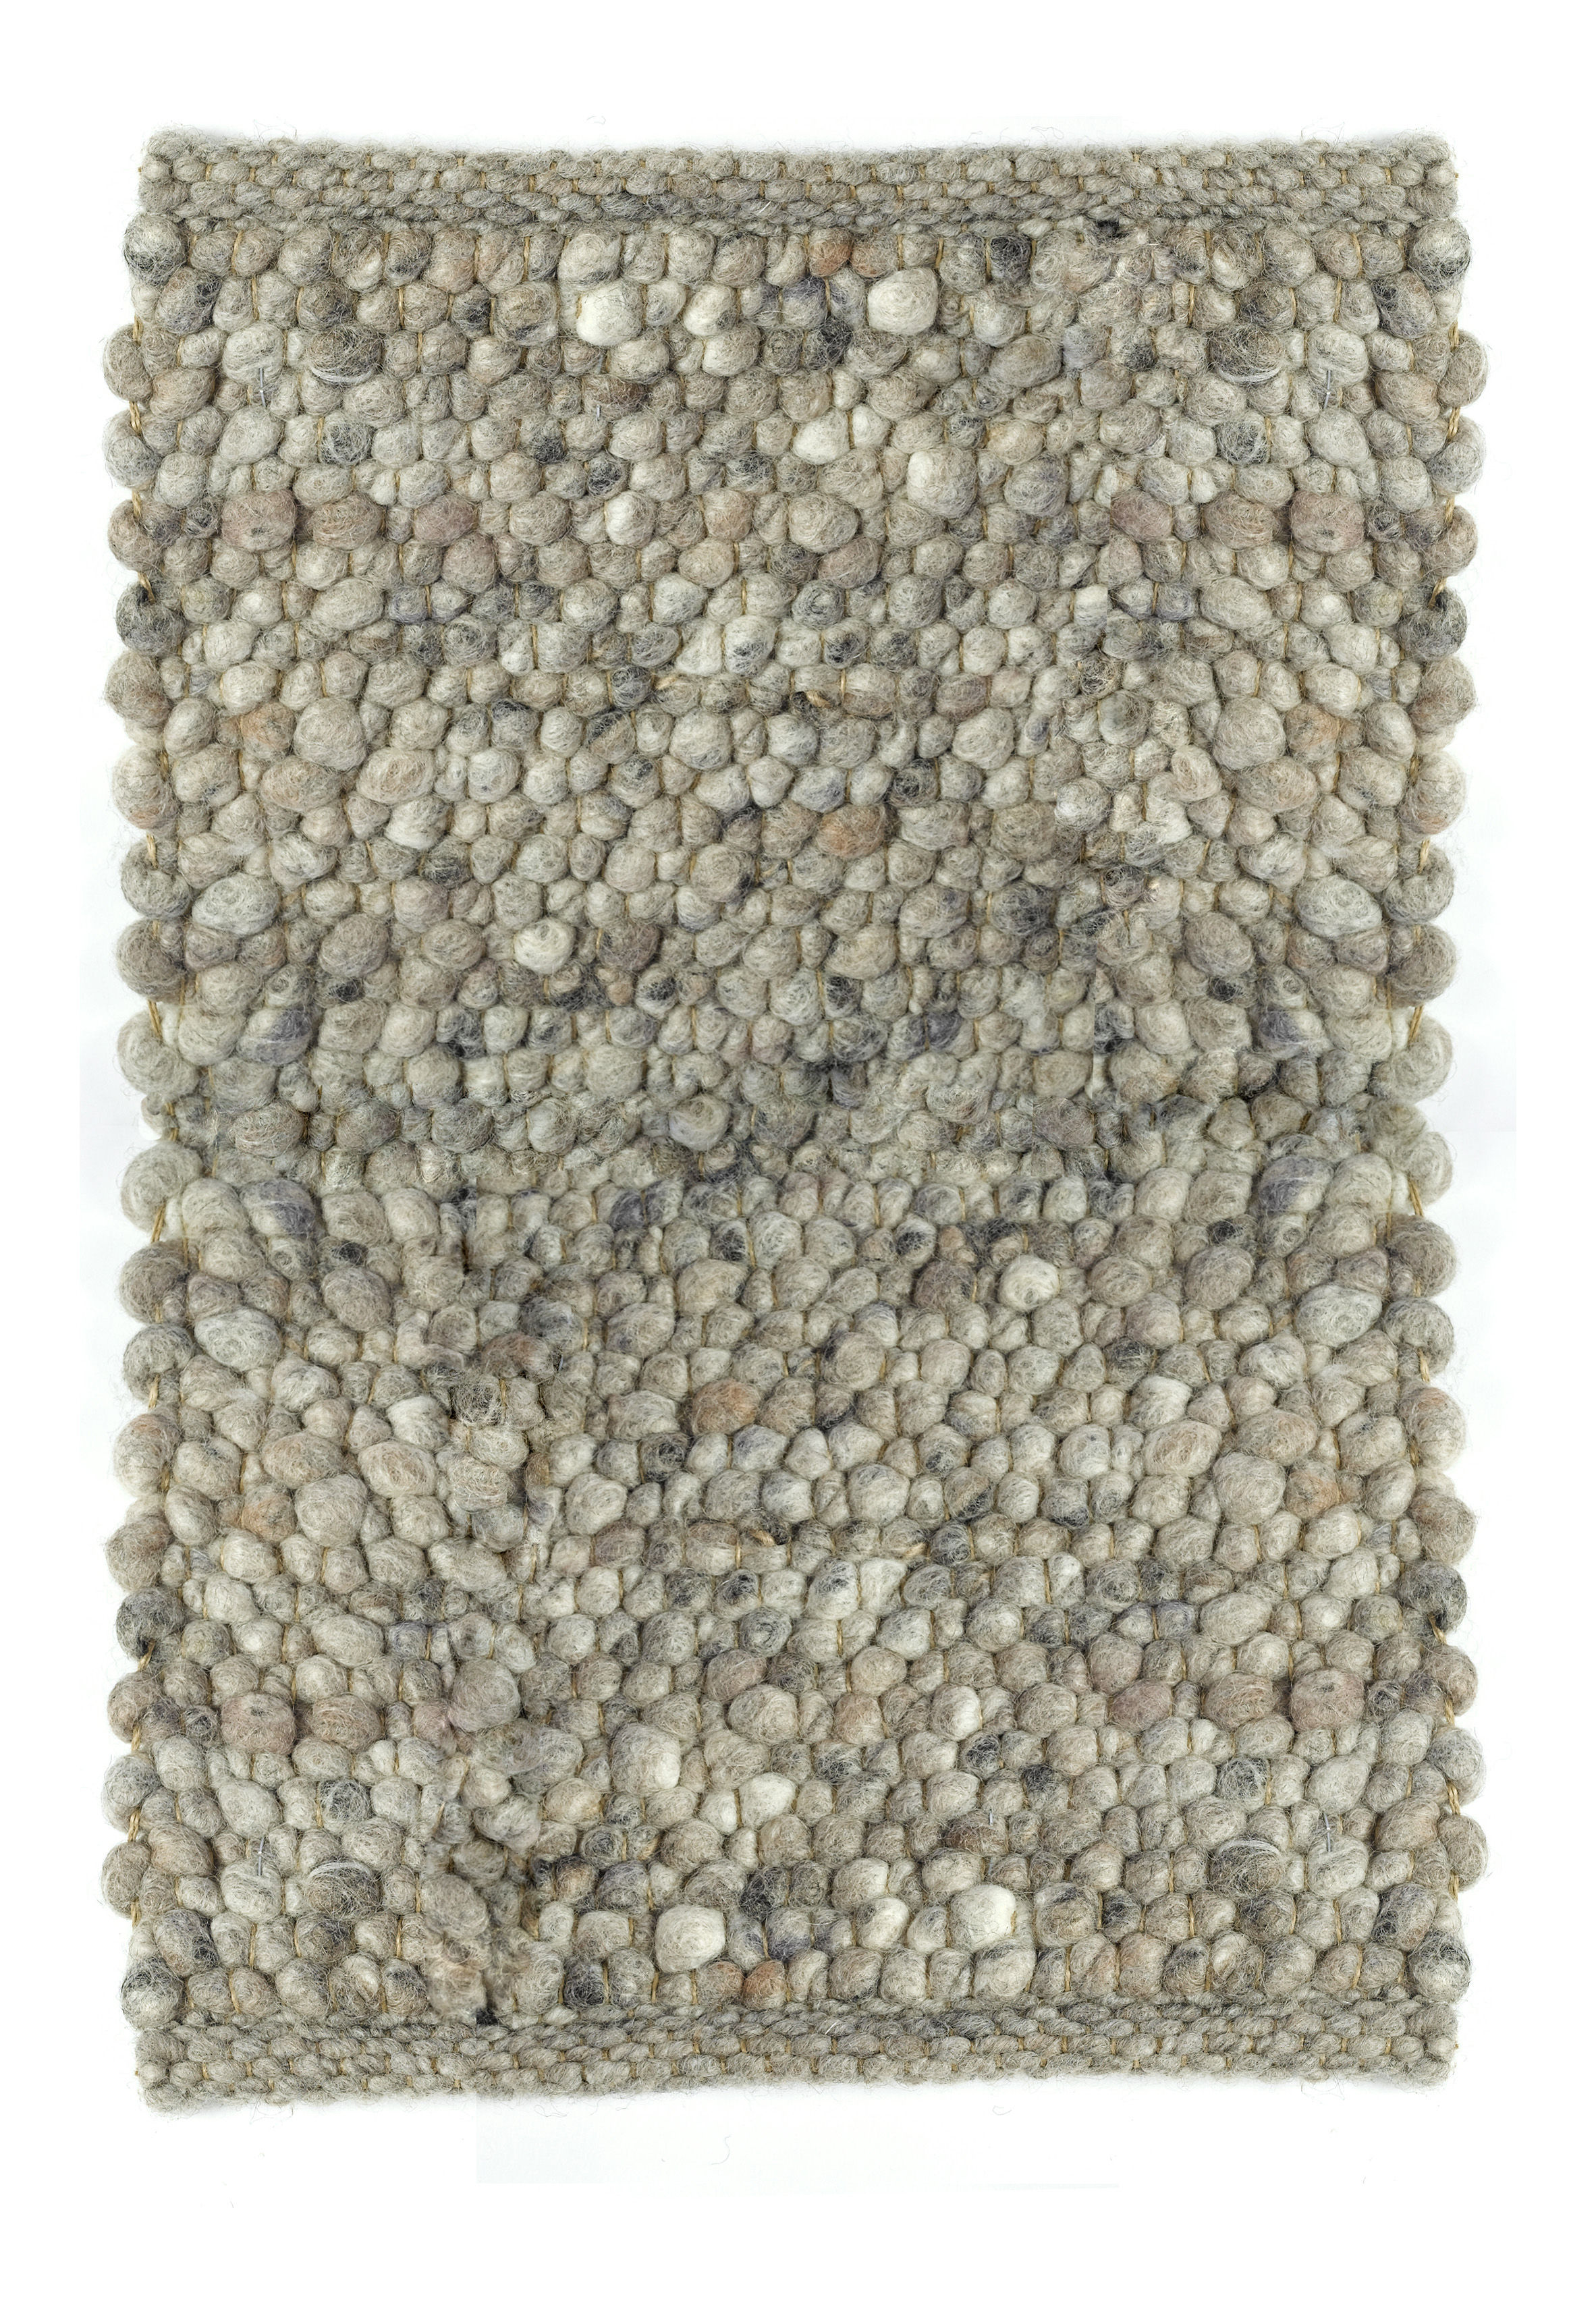 carpet pebbles 170 x 230 cm pols potten teppich. Black Bedroom Furniture Sets. Home Design Ideas